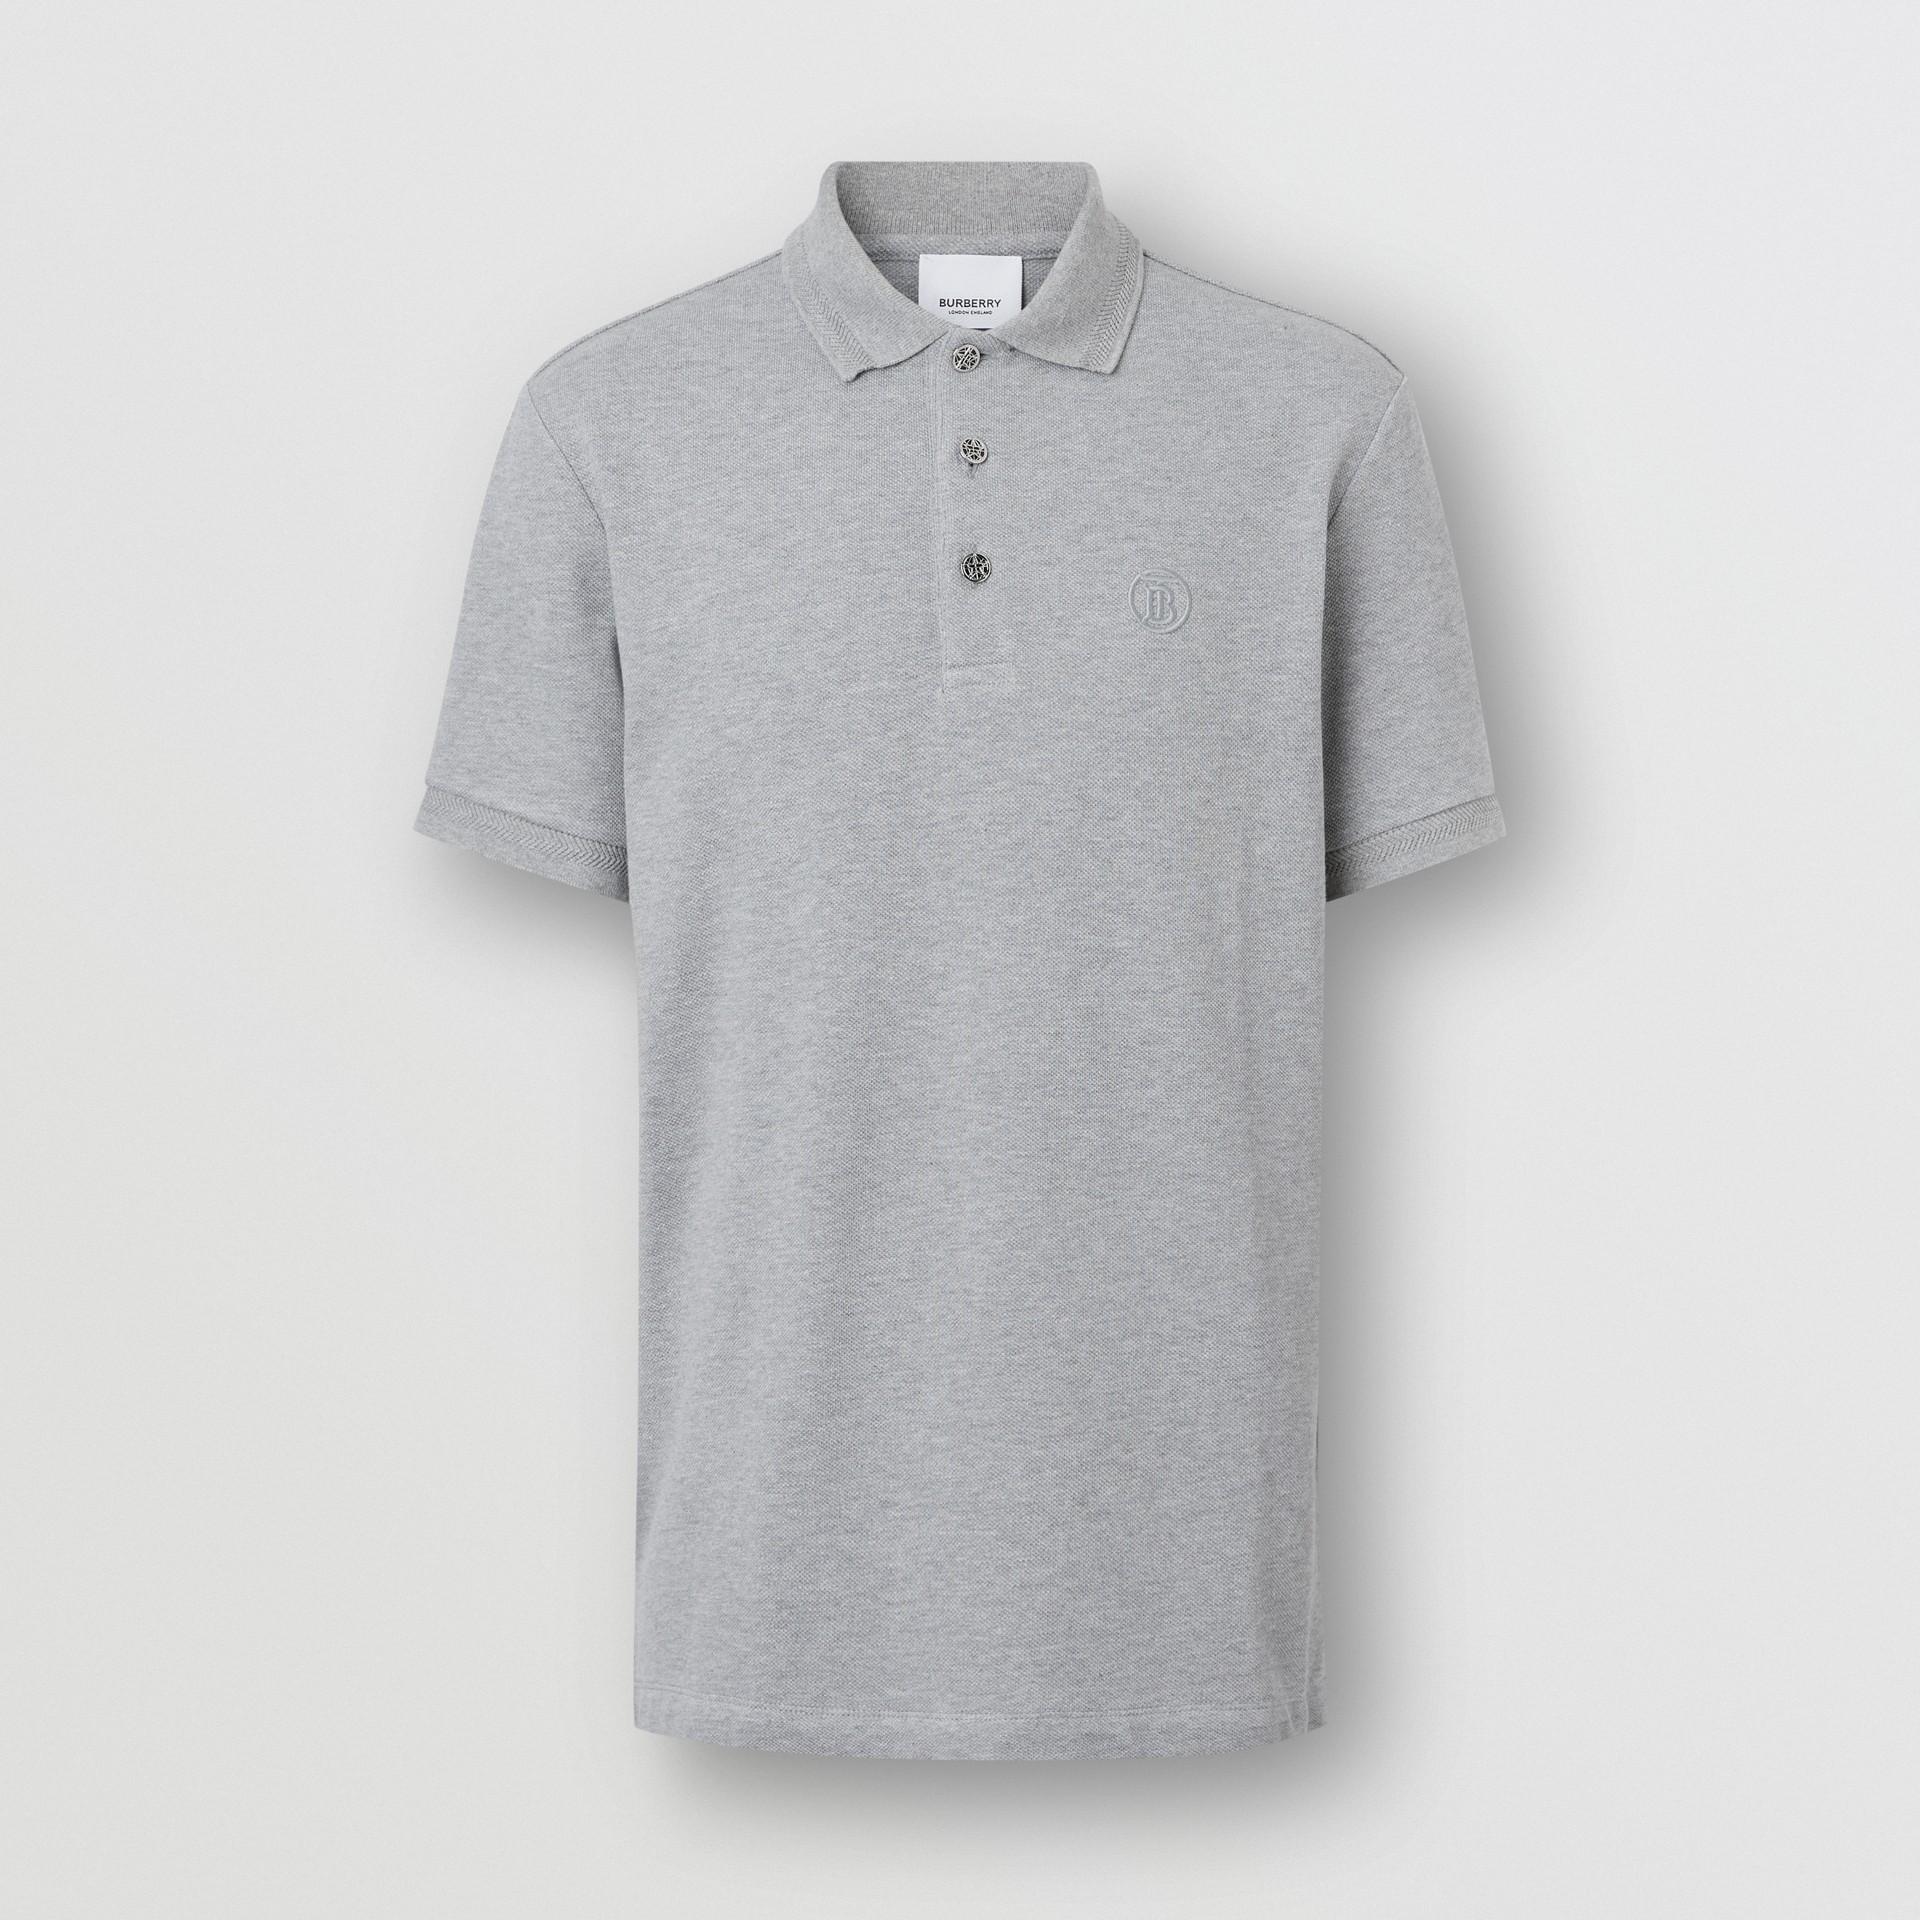 Button Detail Cotton Piqué Polo Shirt in Pale Grey Melange - Men | Burberry Canada - gallery image 3